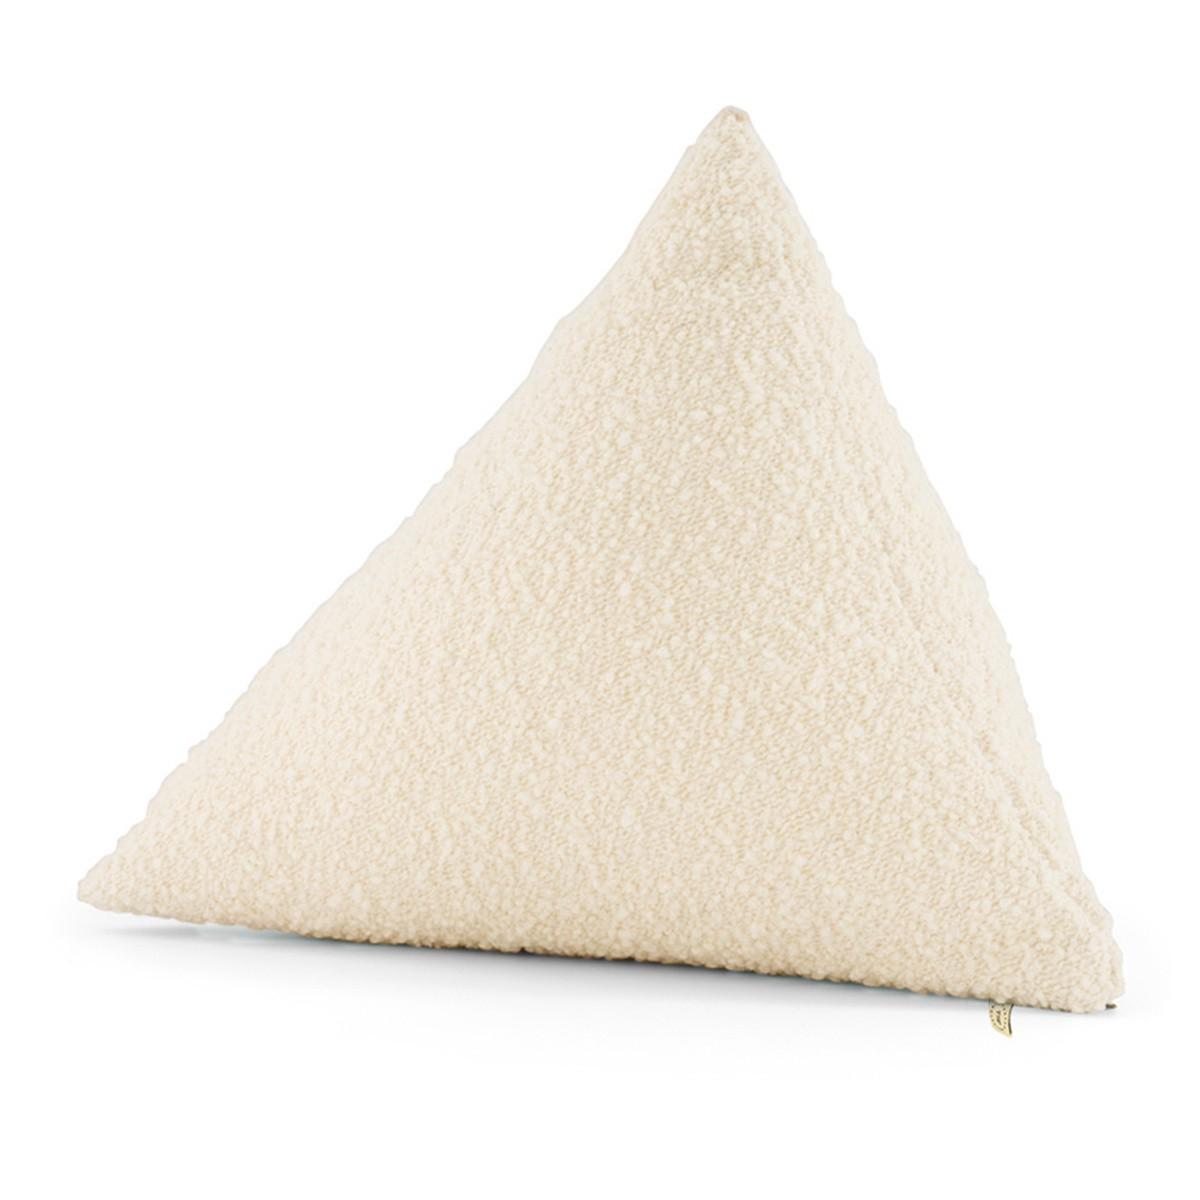 Divino cushion in cream white curly wool